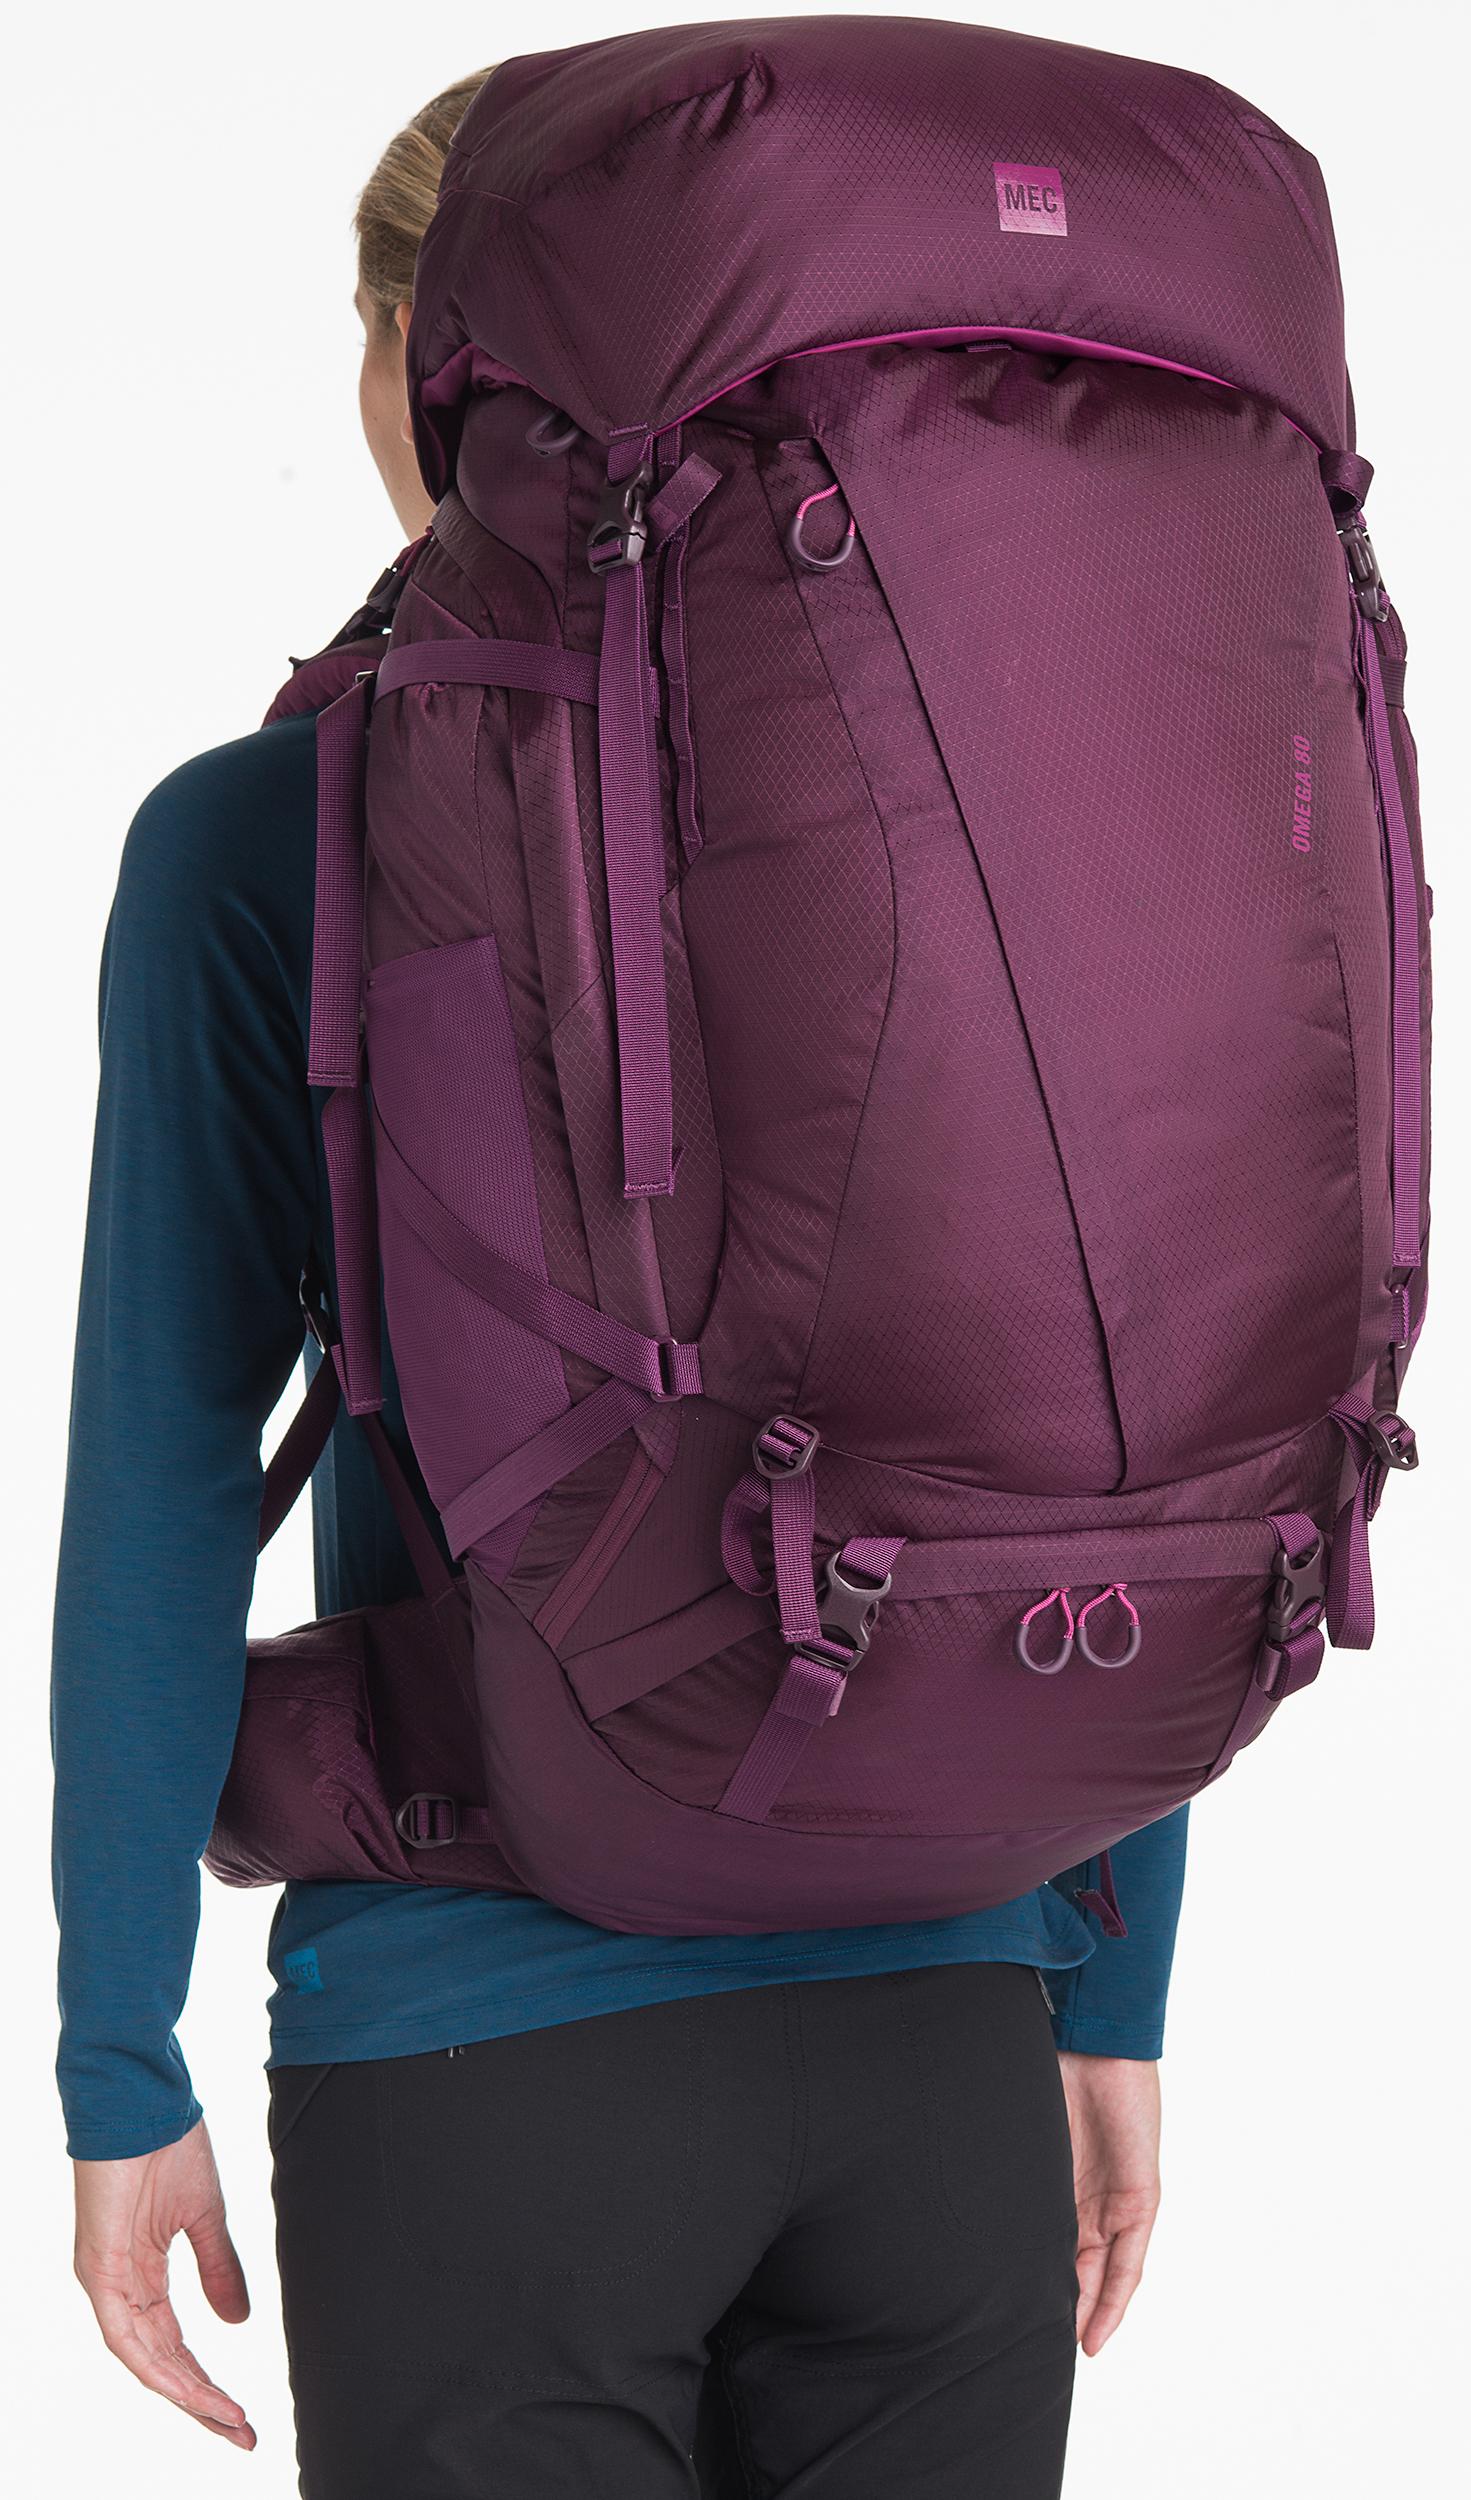 fb31e0eba4c Backpacking packs